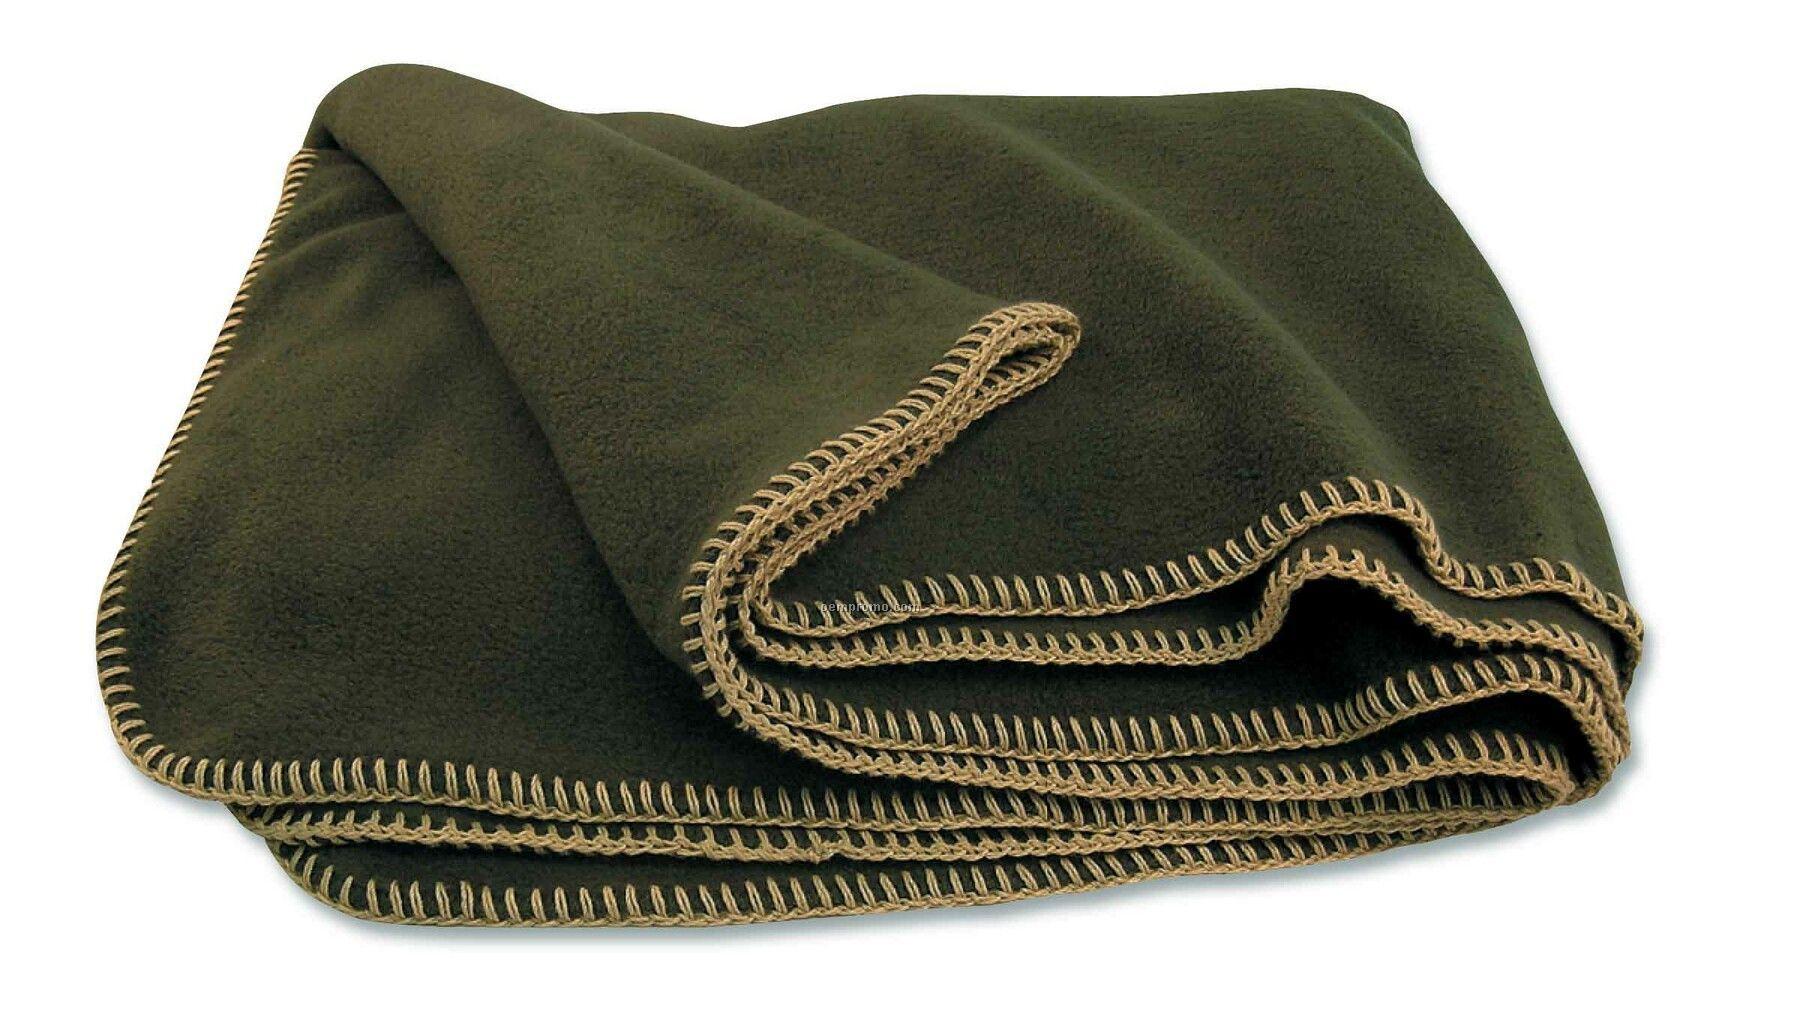 Vintage Fleece Blanket China Wholesale Vintage Fleece Blanket